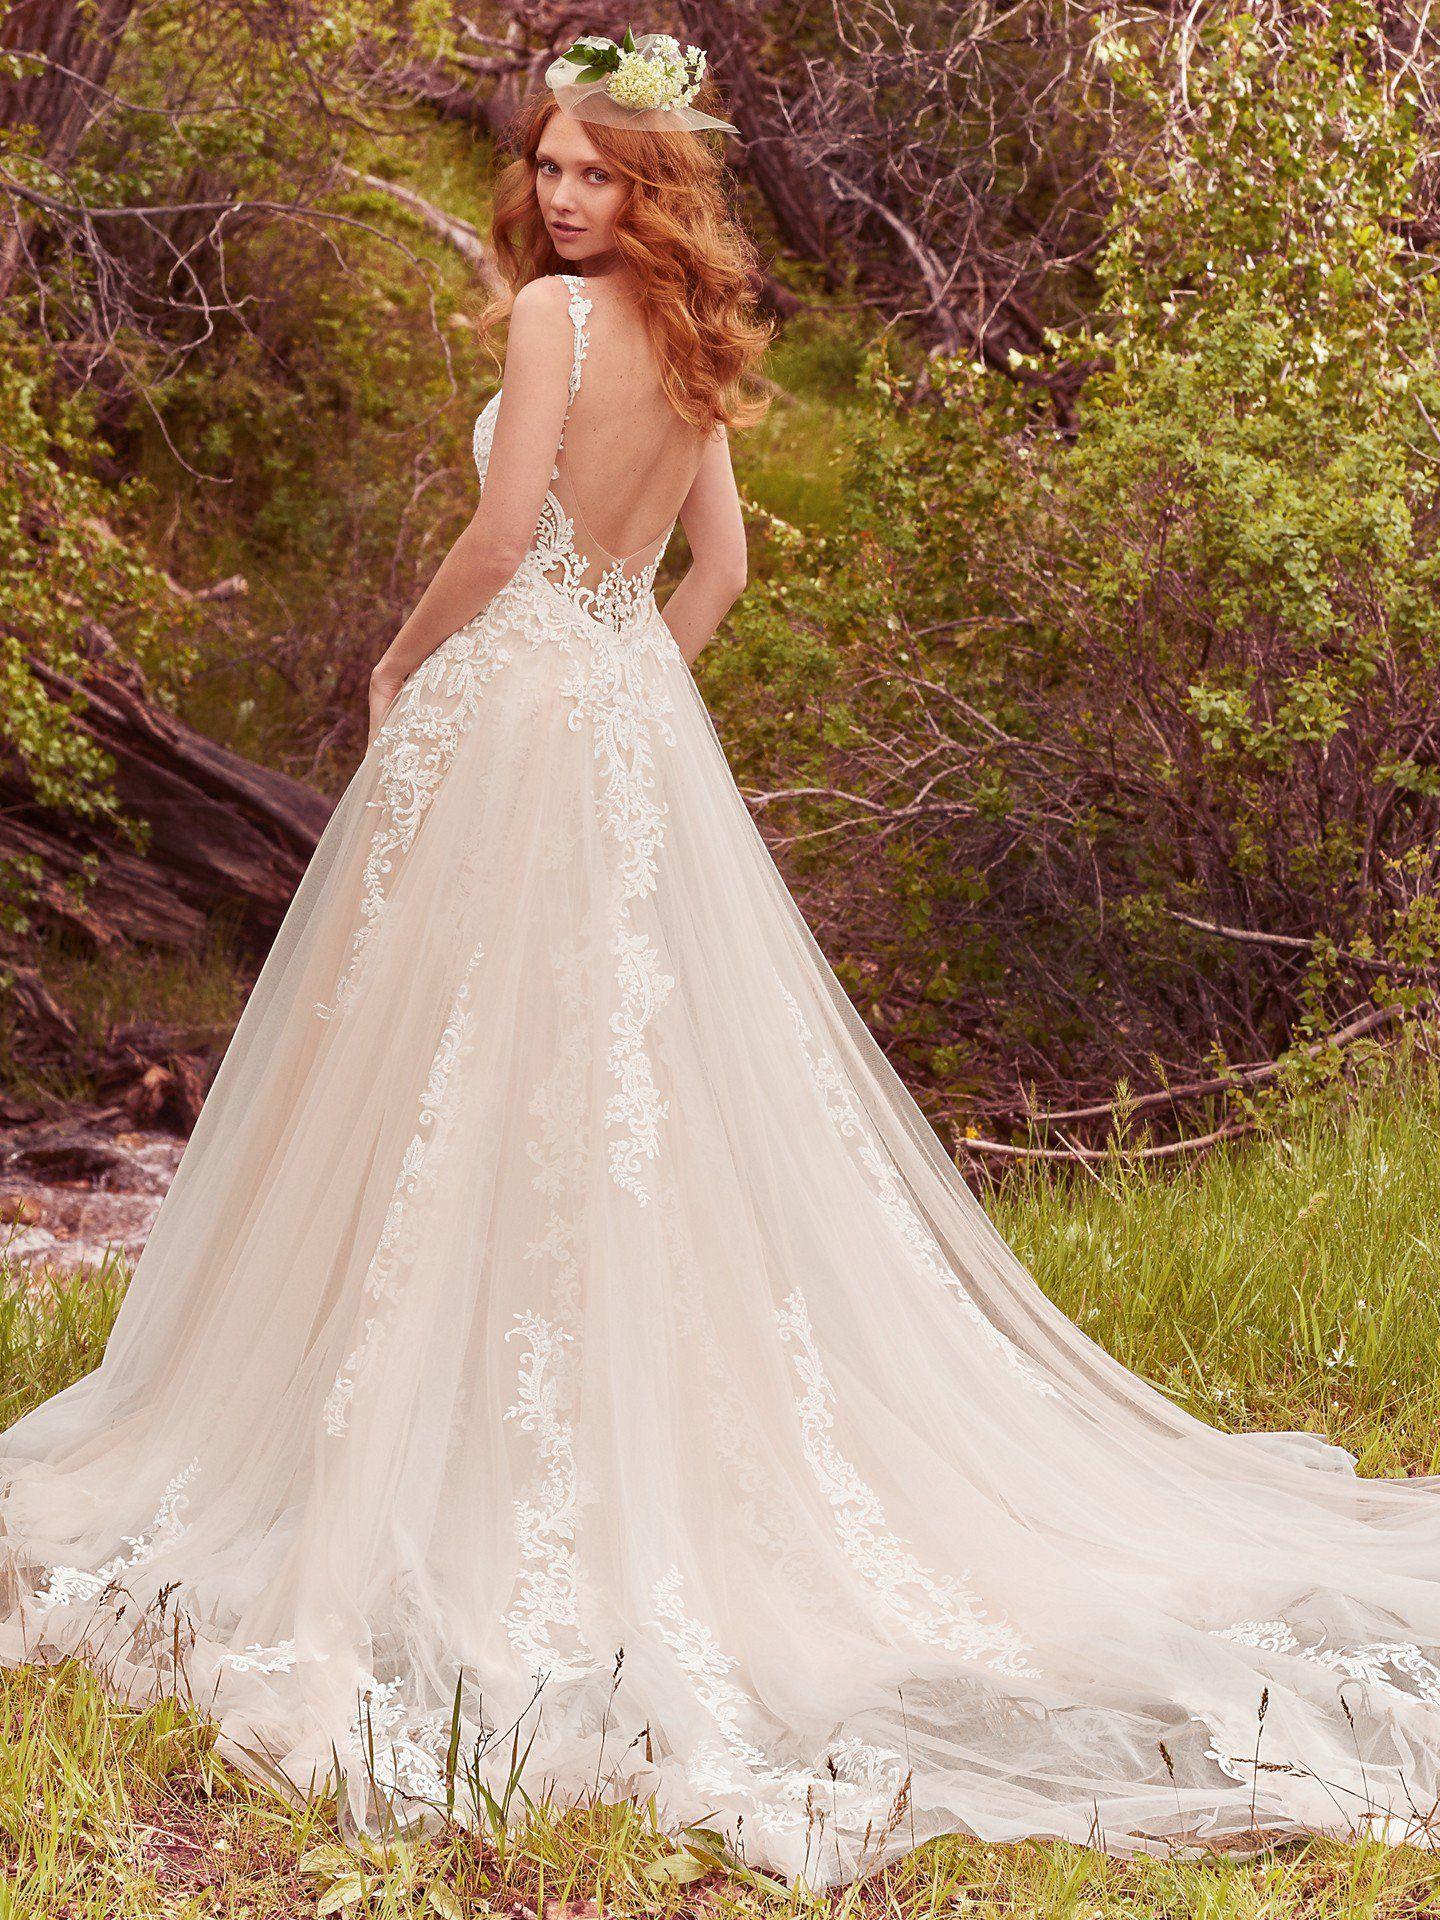 330d4e86c67 VANA by Maggie Sottero Wedding Dresses